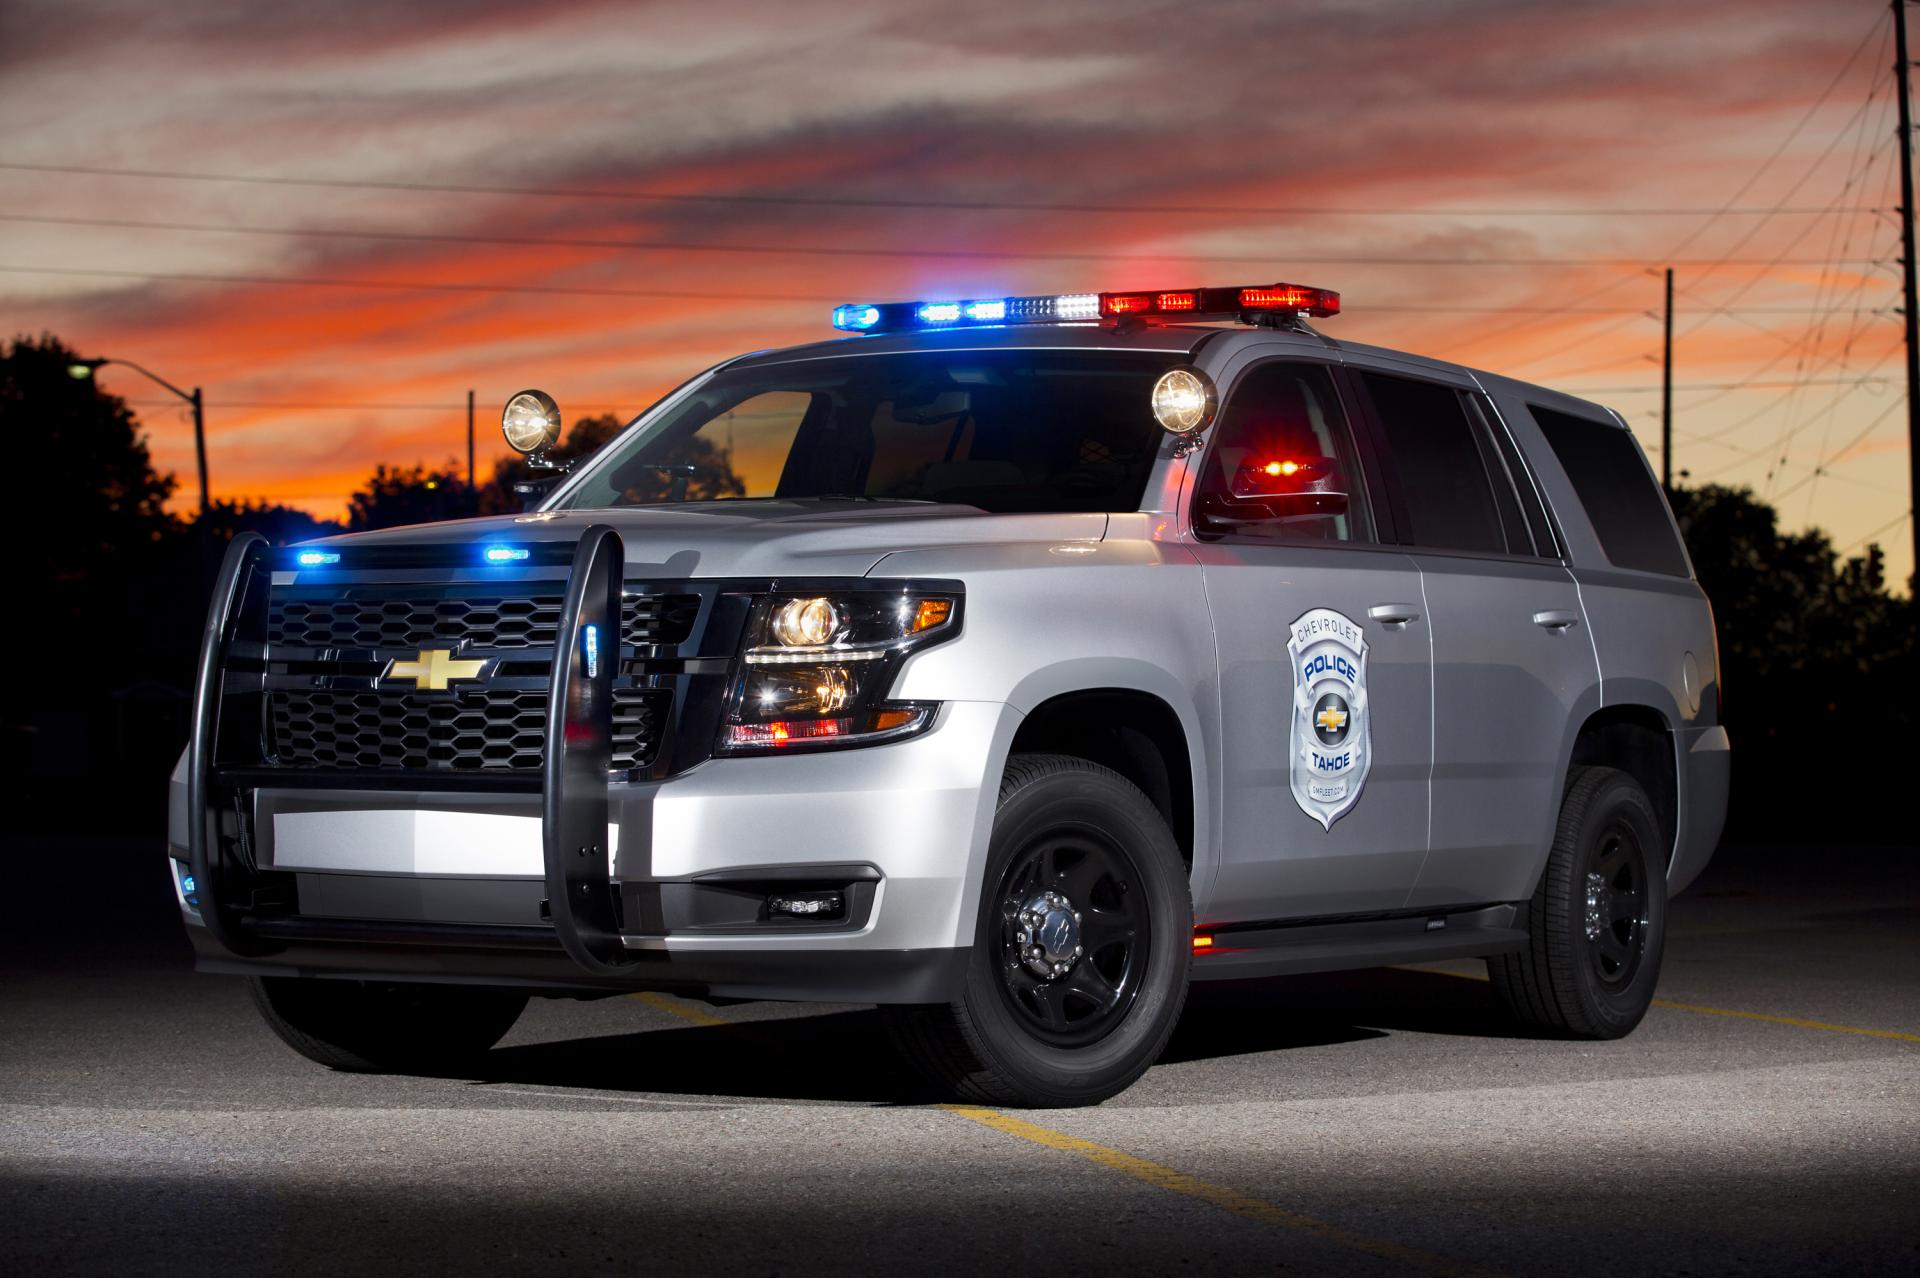 2013 Chevrolet Tahoe Police Concept - Conceptcarz